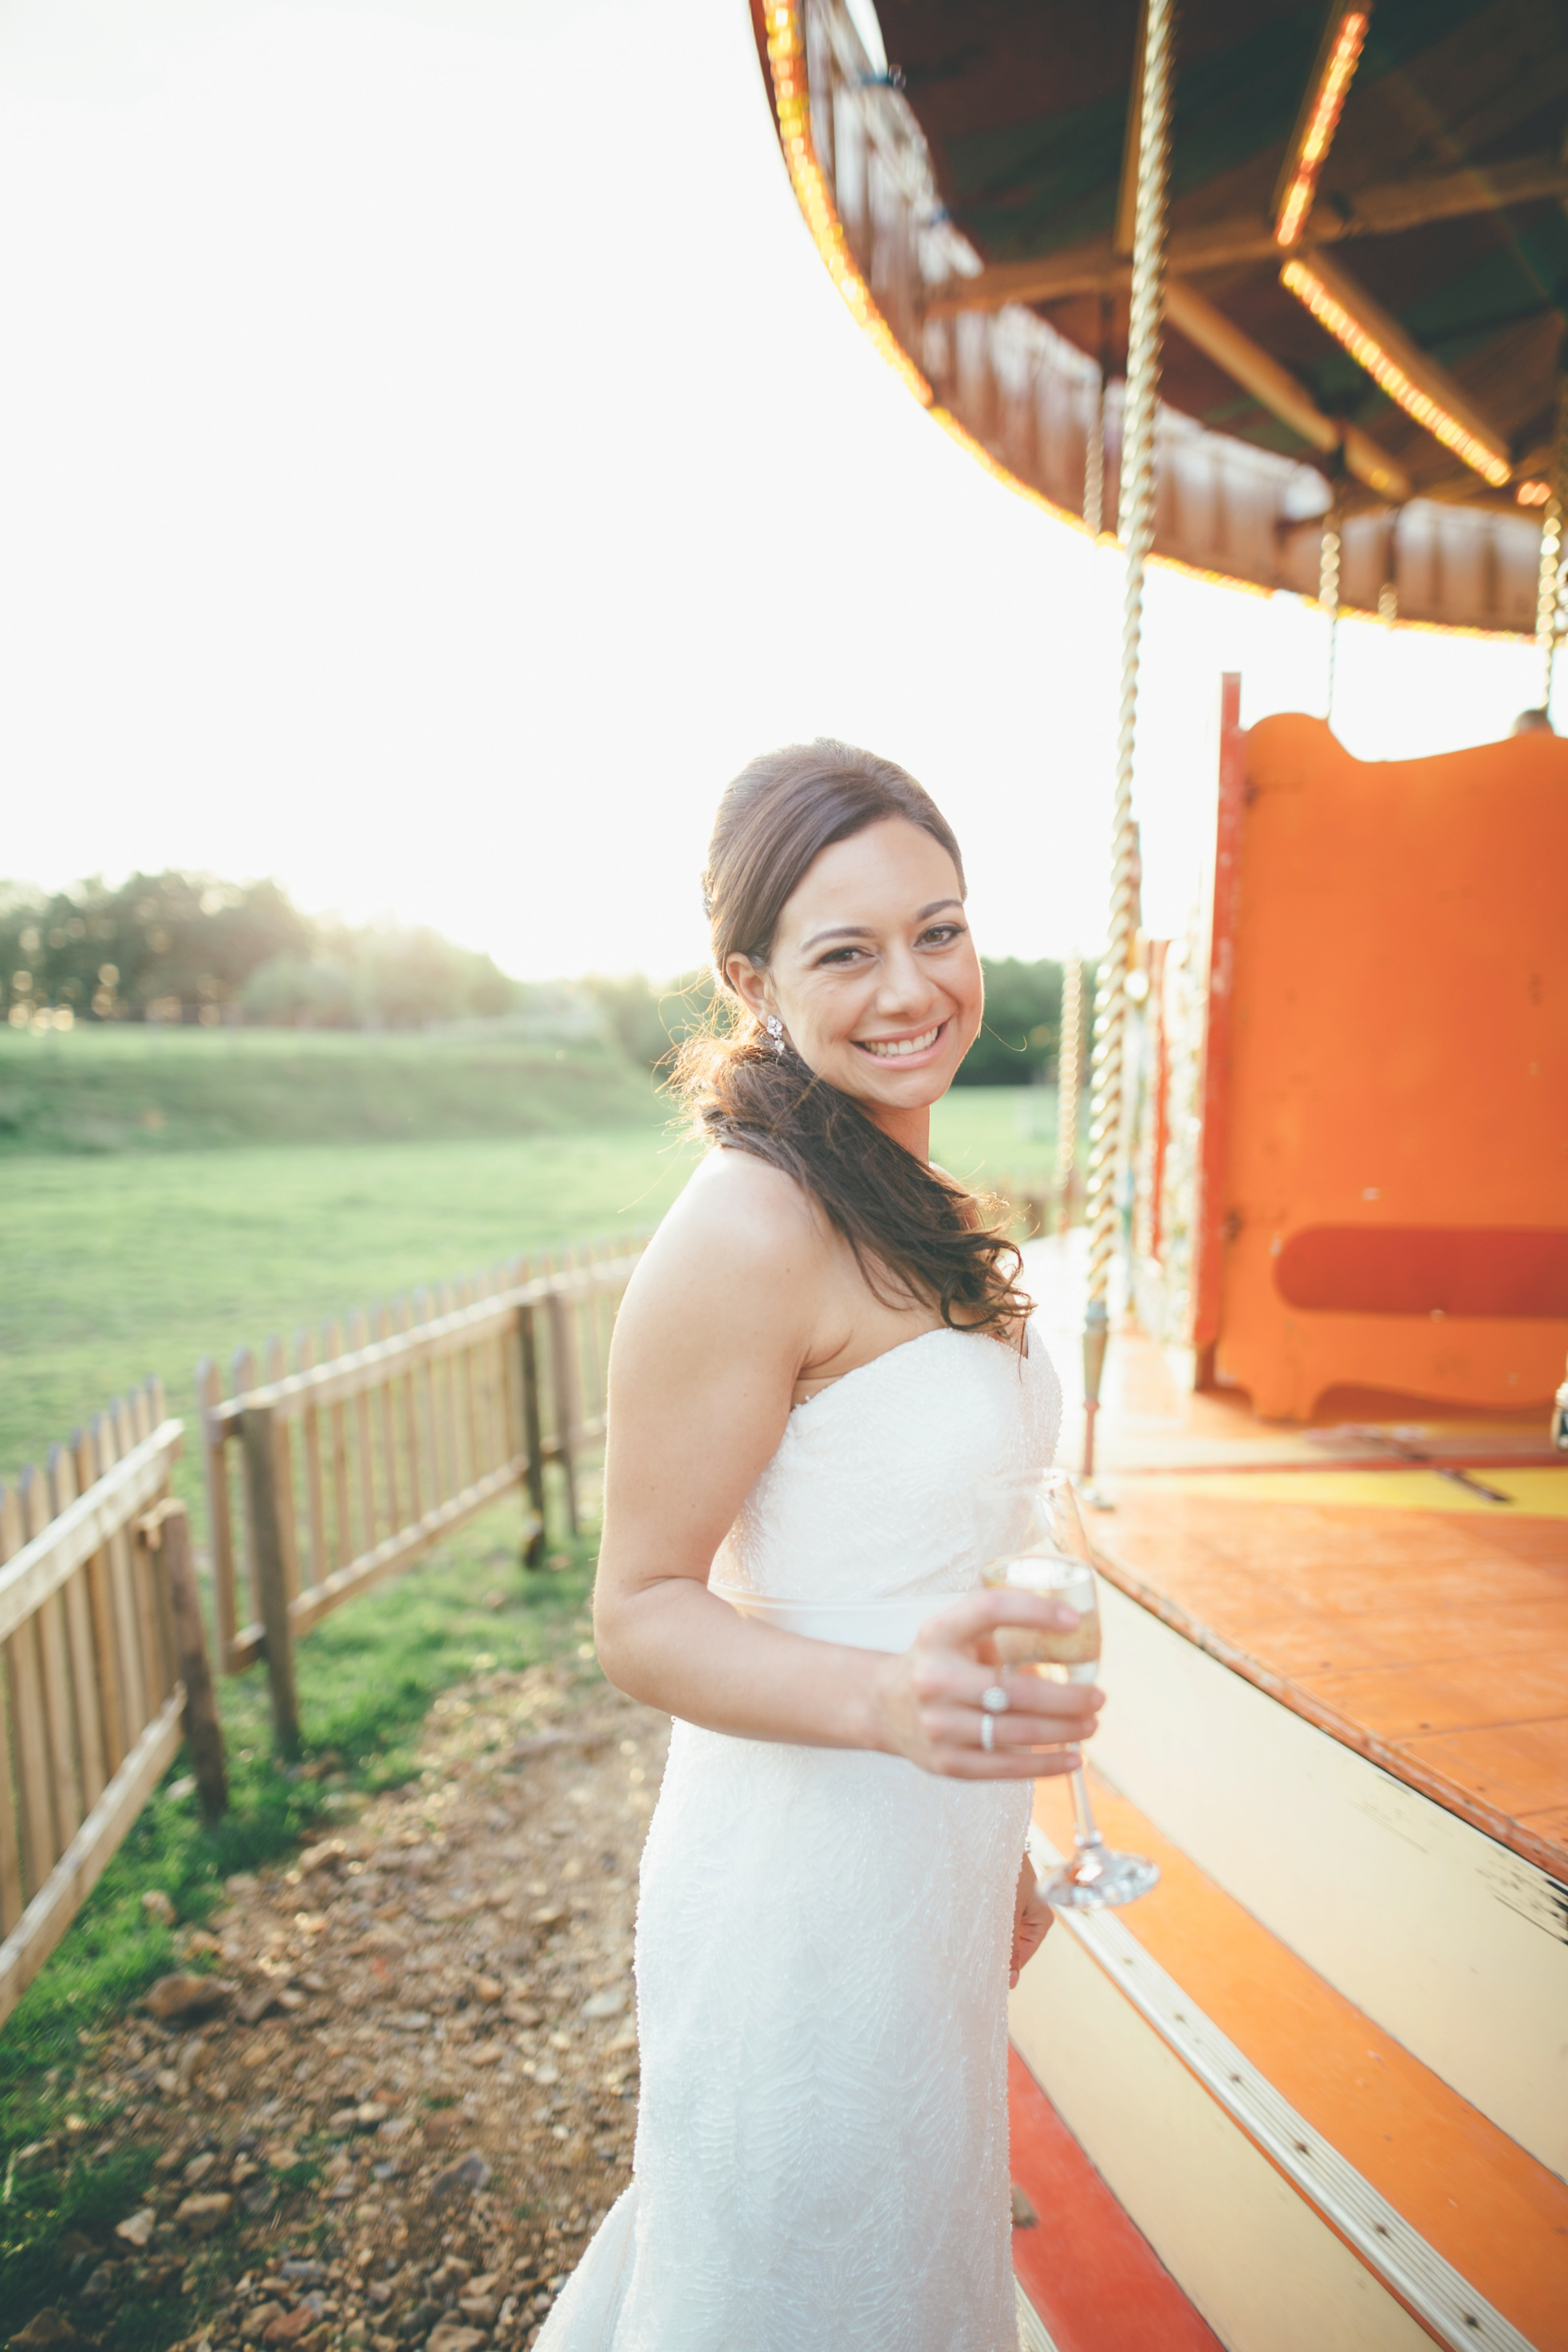 ClaireKieranwedding_PrestonCourtCanterbury_0040.jpg